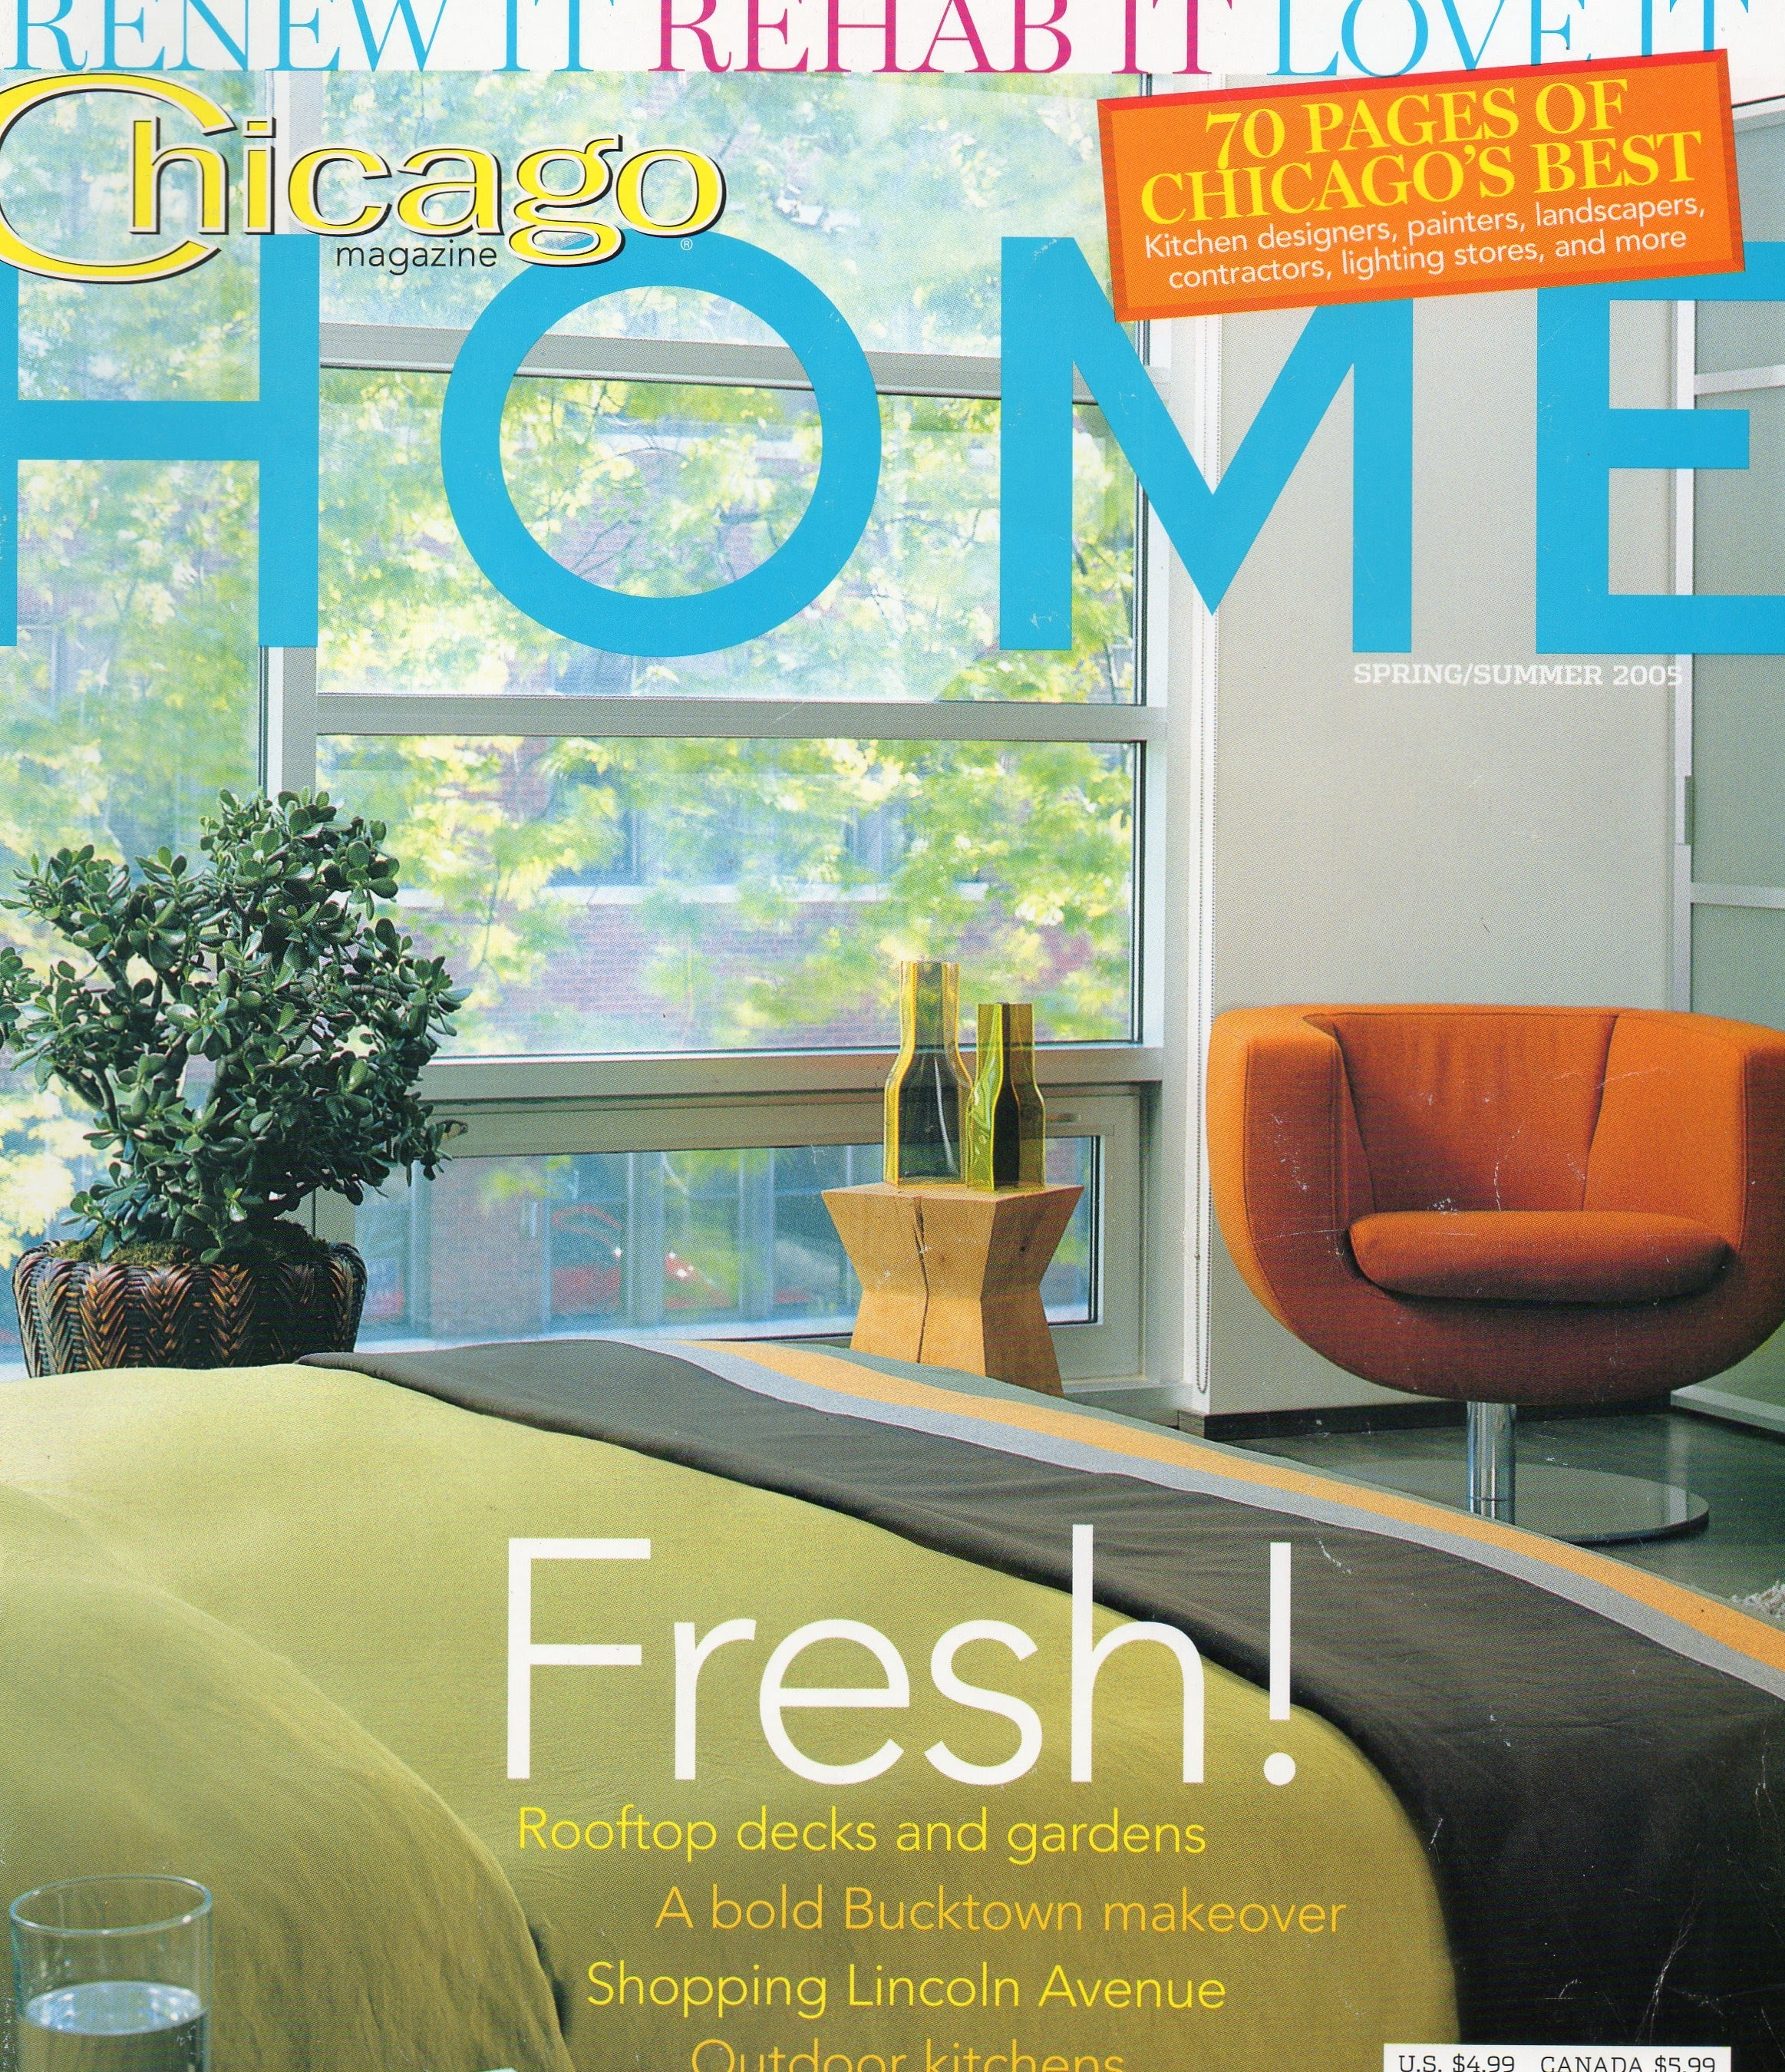 chgo home cover spring 05.jpg